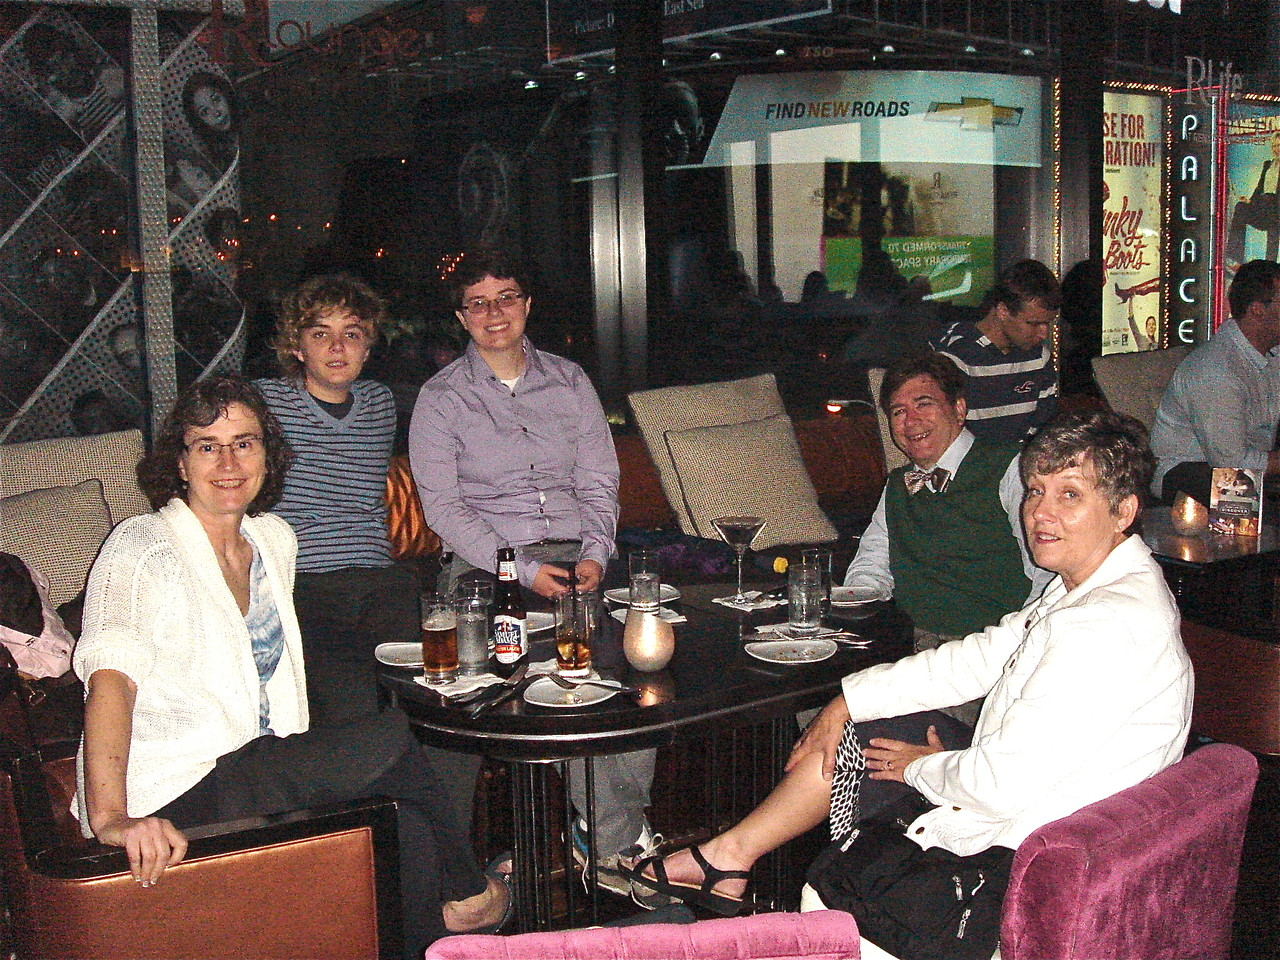 Ann, Kathleen, Emilea, John & Cindy Times Square